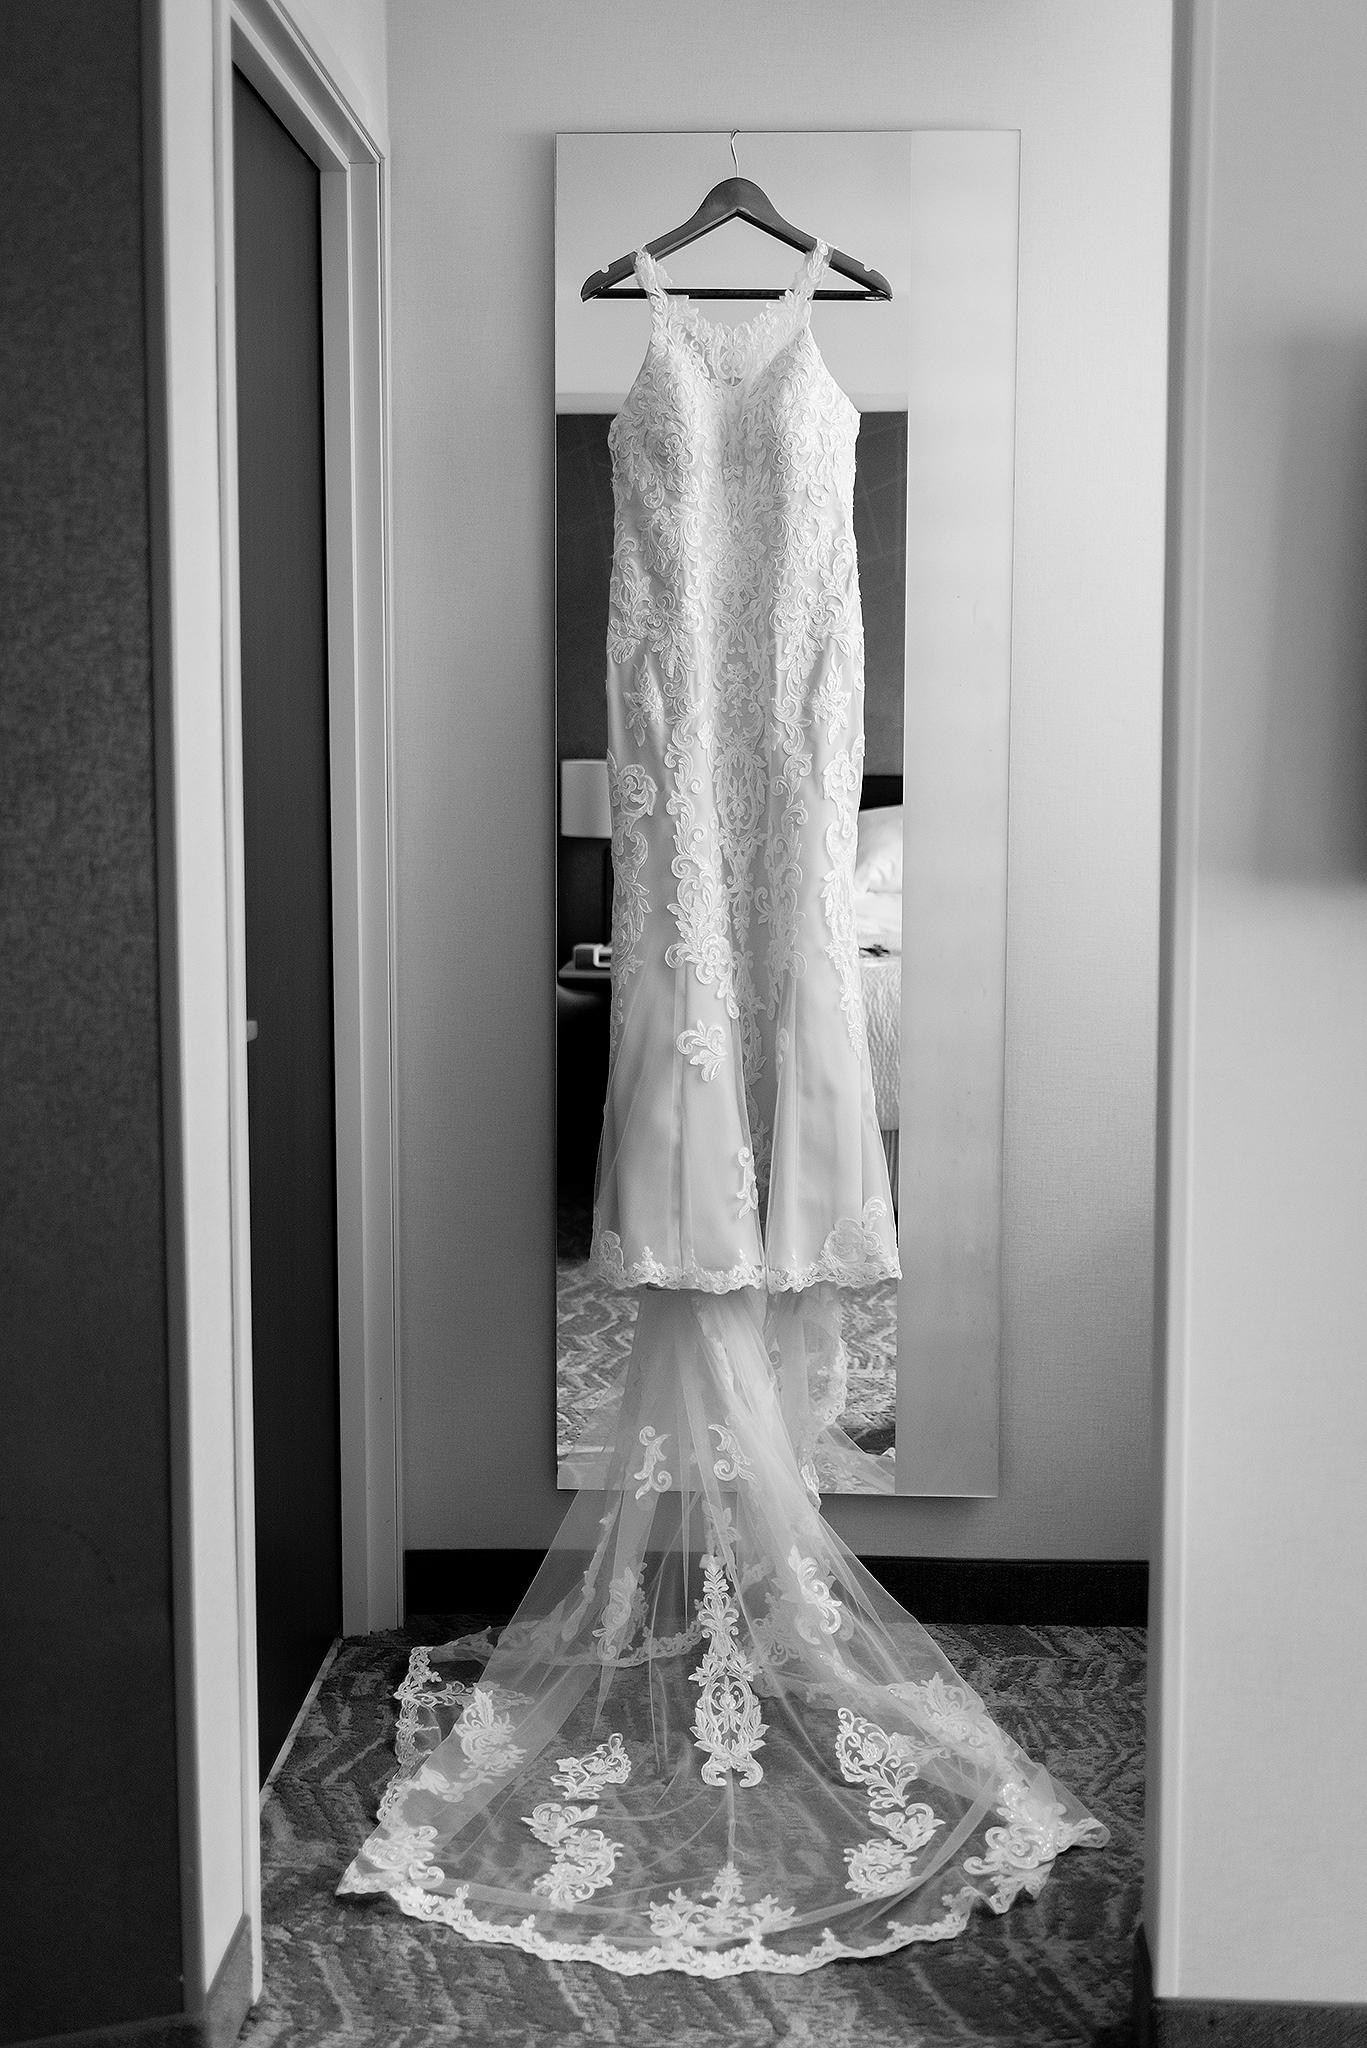 LINDSAY-ADKINS-PHOTOGRAPHY-MICHIGAN-WEDDING-PHOTOGRAPHER-FRANKENMUTH-BREWERY-WEDDING-MICHIGAN-BLOG-8